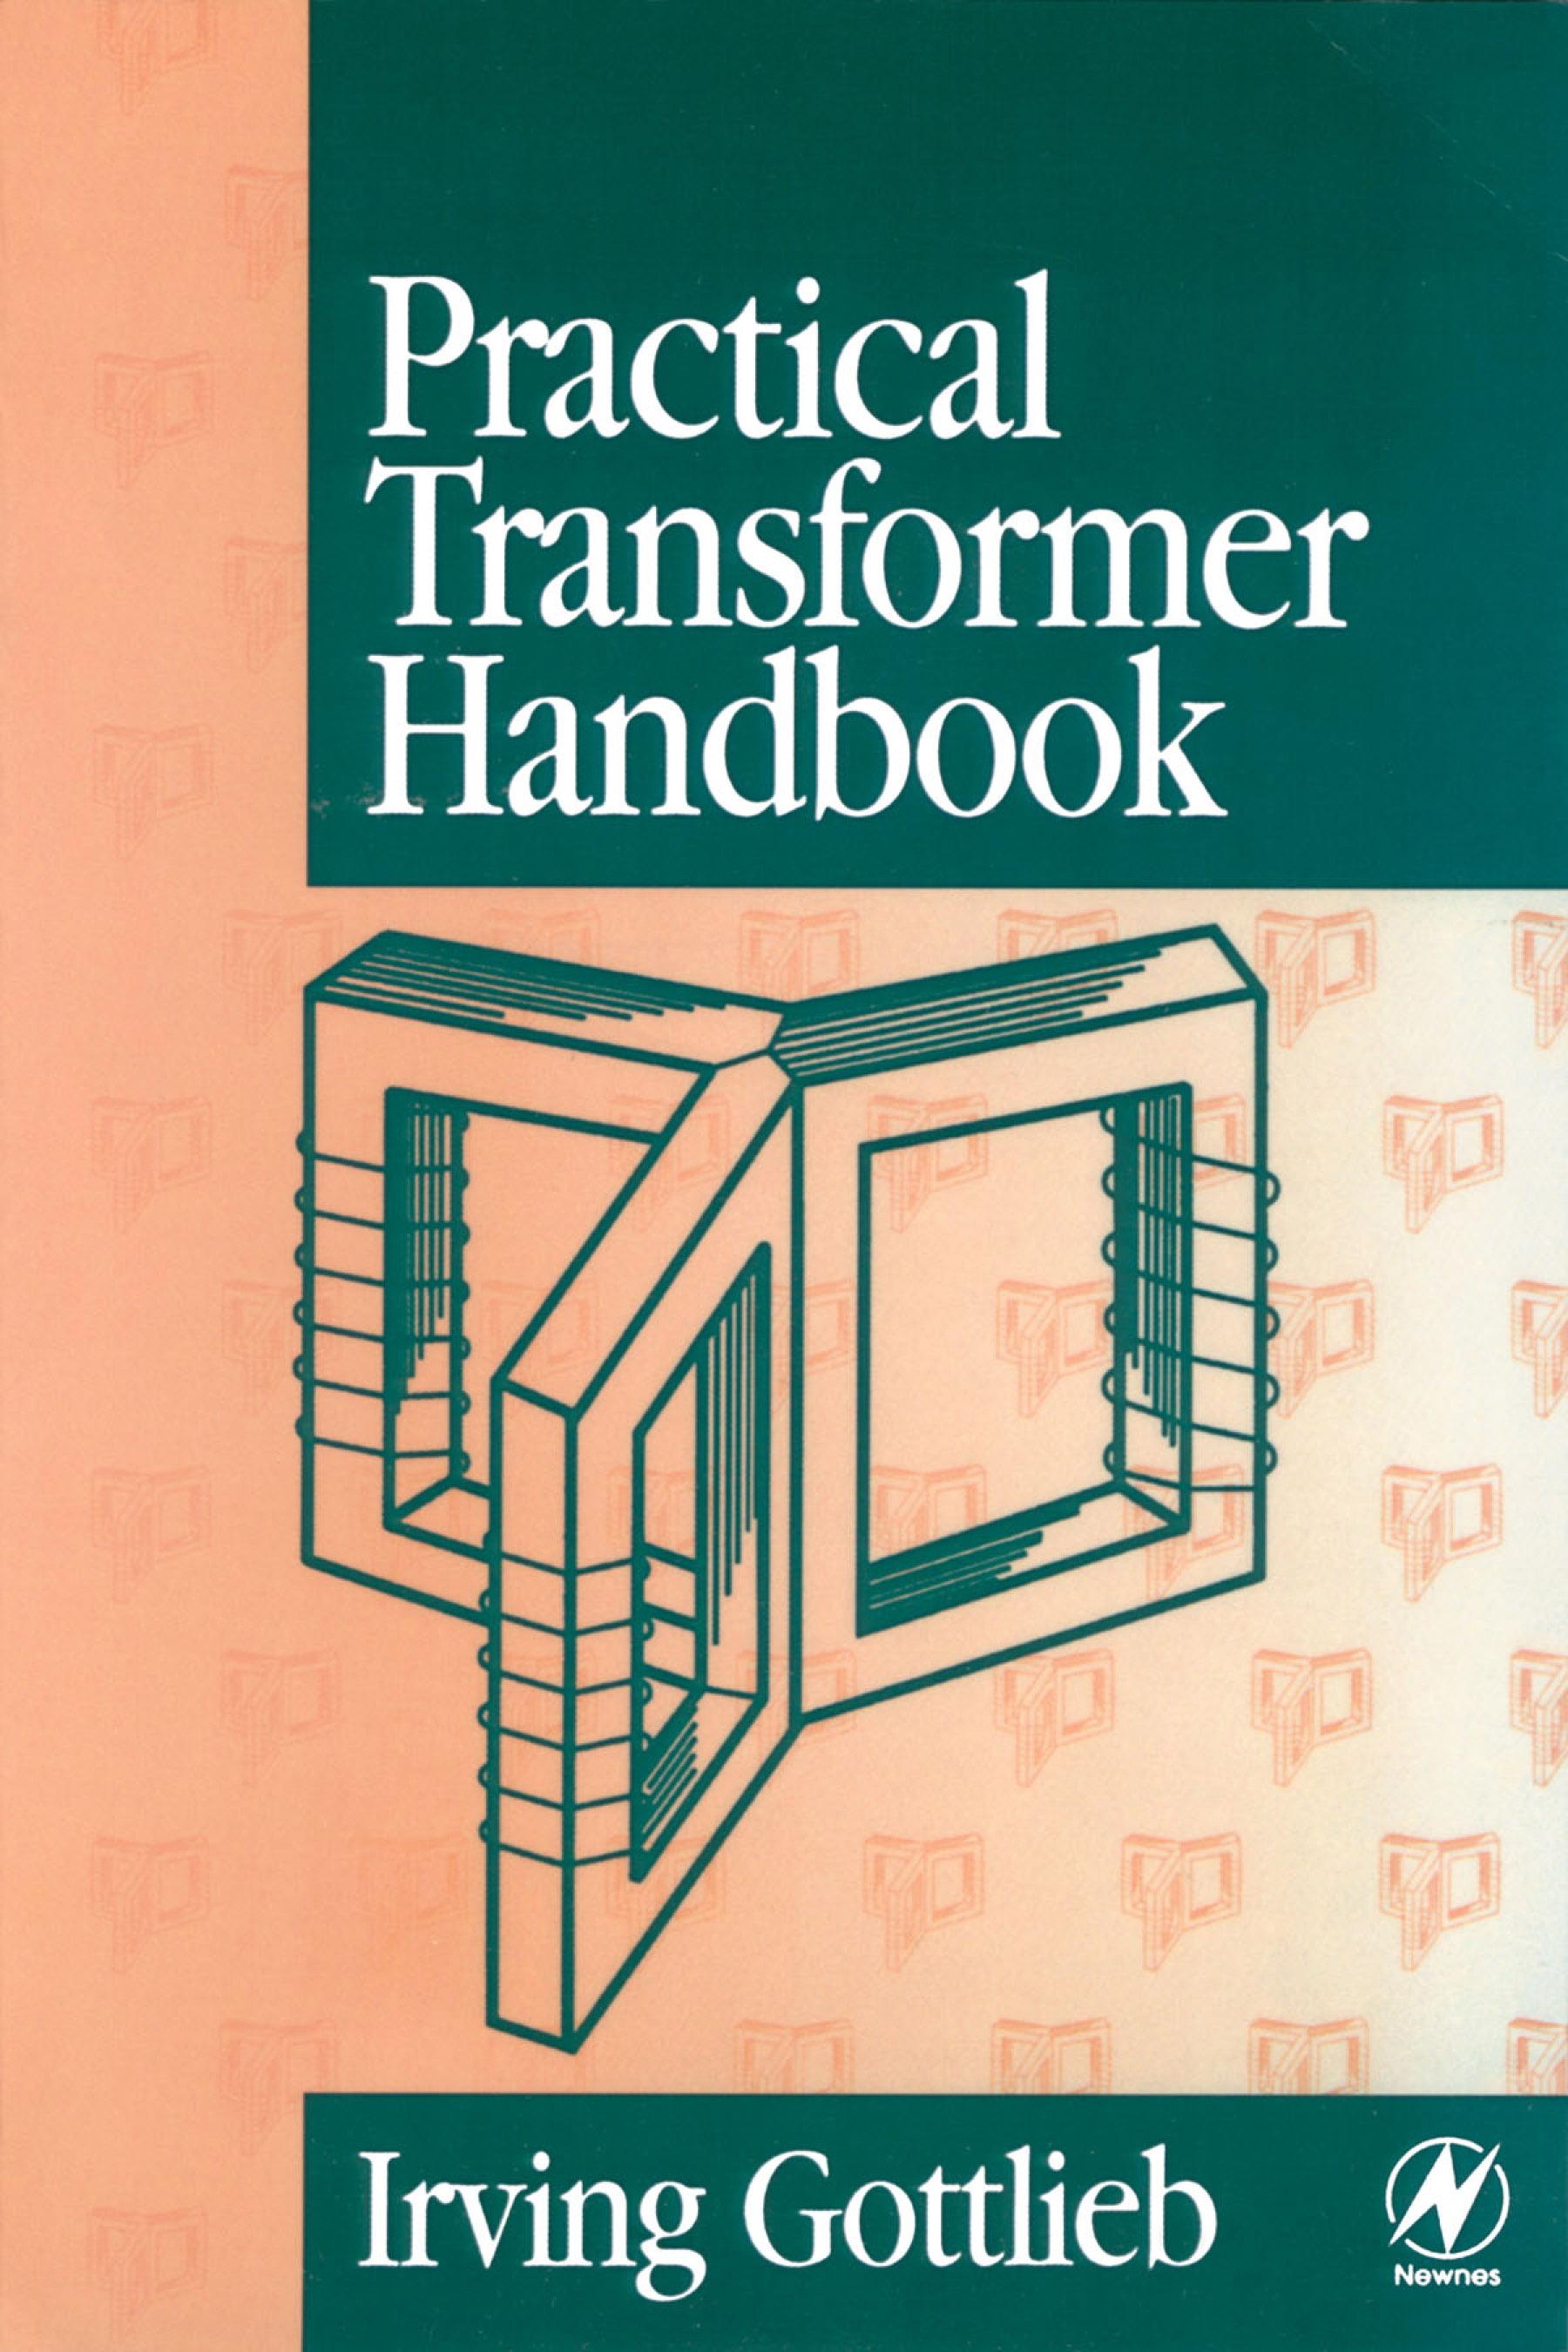 Practical Transformer Handbook: for Electronics, Radio and Communications Engineers EB9780080514567